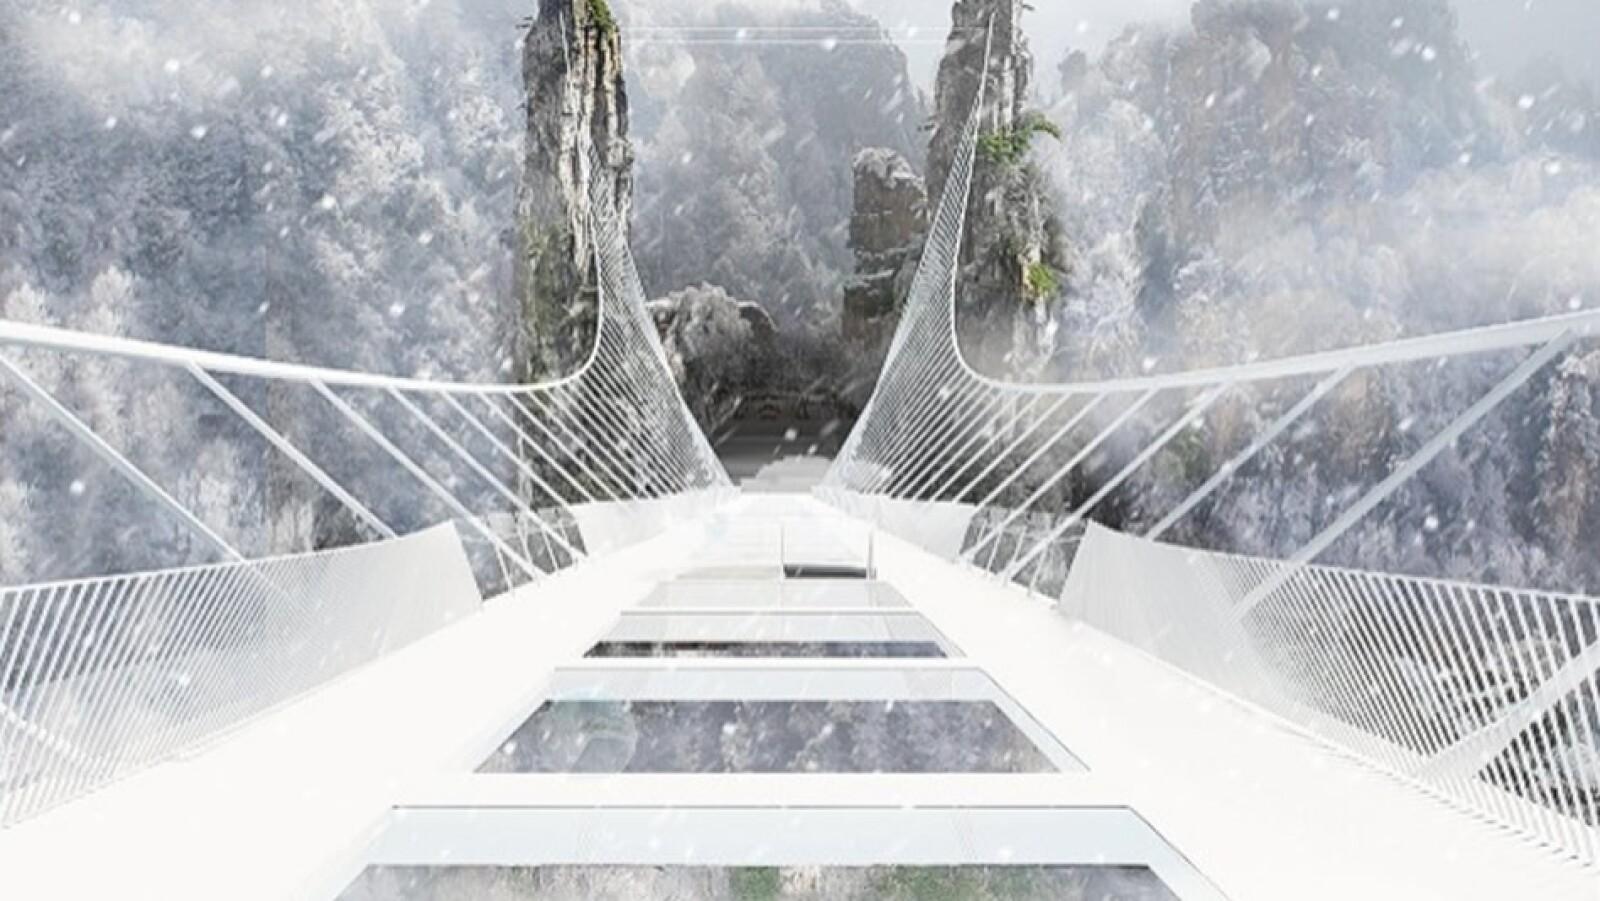 Puente piso cristal Zhangjiajie boceto